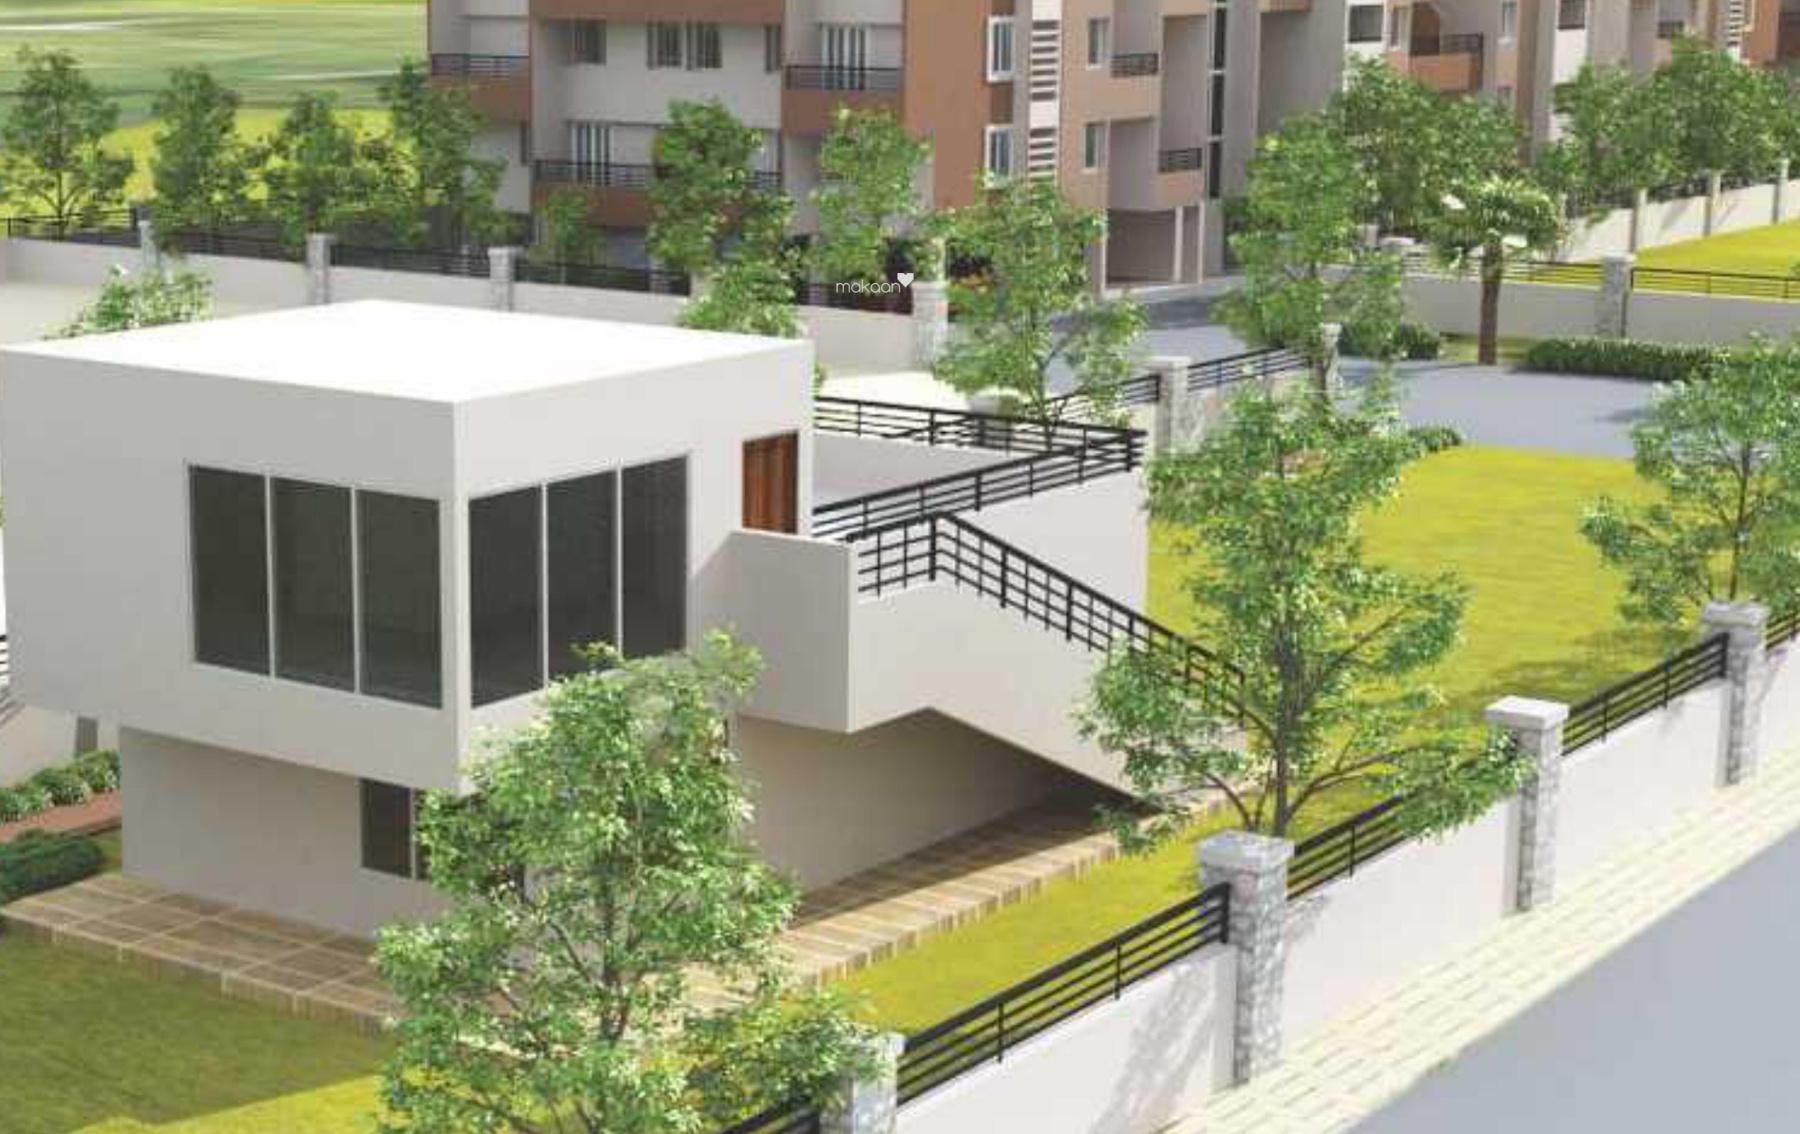 1050 sq ft 2BHK 2BHK+2T (1,050 sq ft) Property By Proptiger In Scrum Utkrash, Hinjewadi